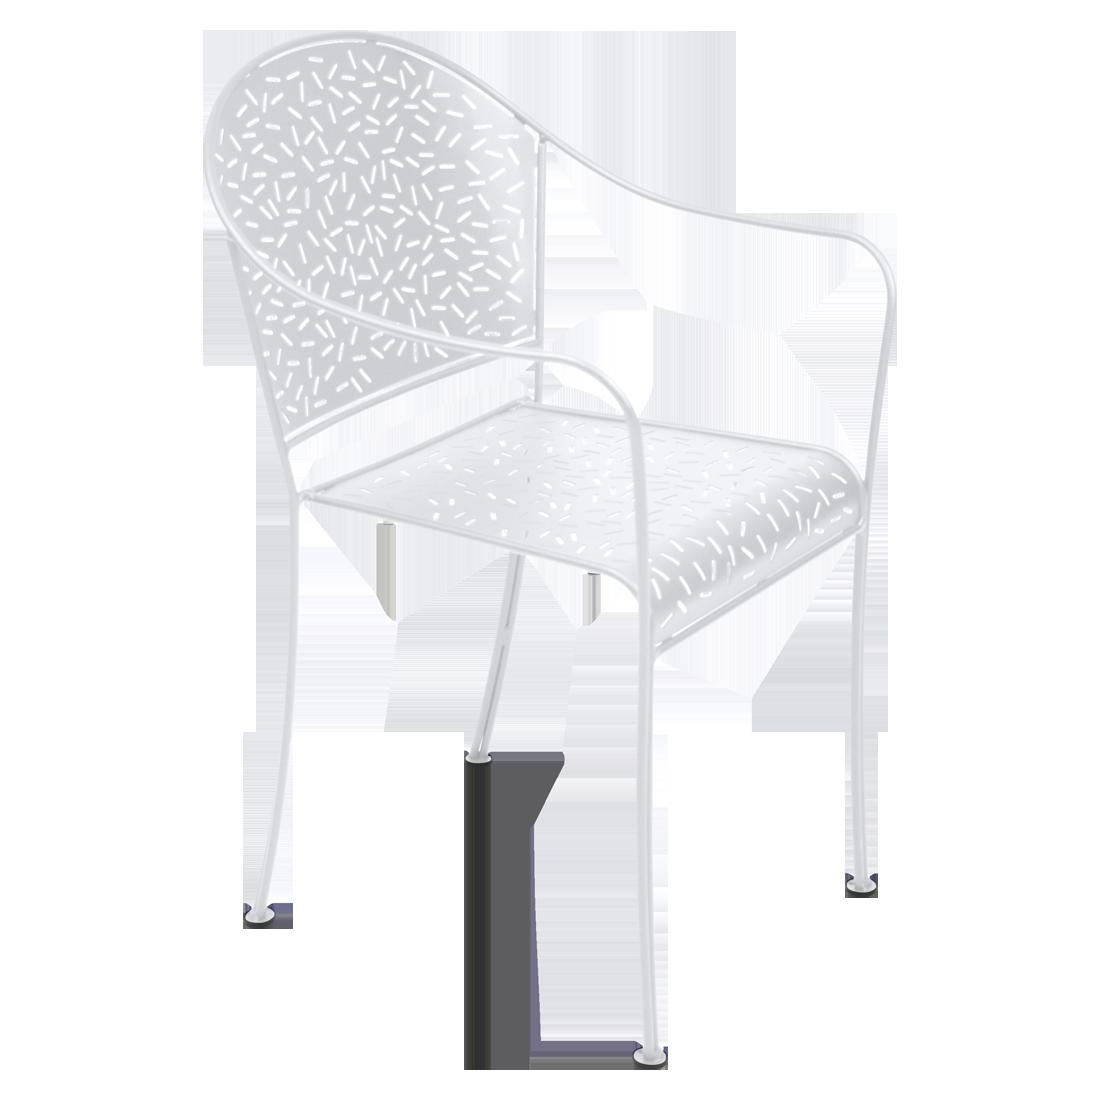 chaise de jardin, chaise metal, chaise terrasse, chaise blanche